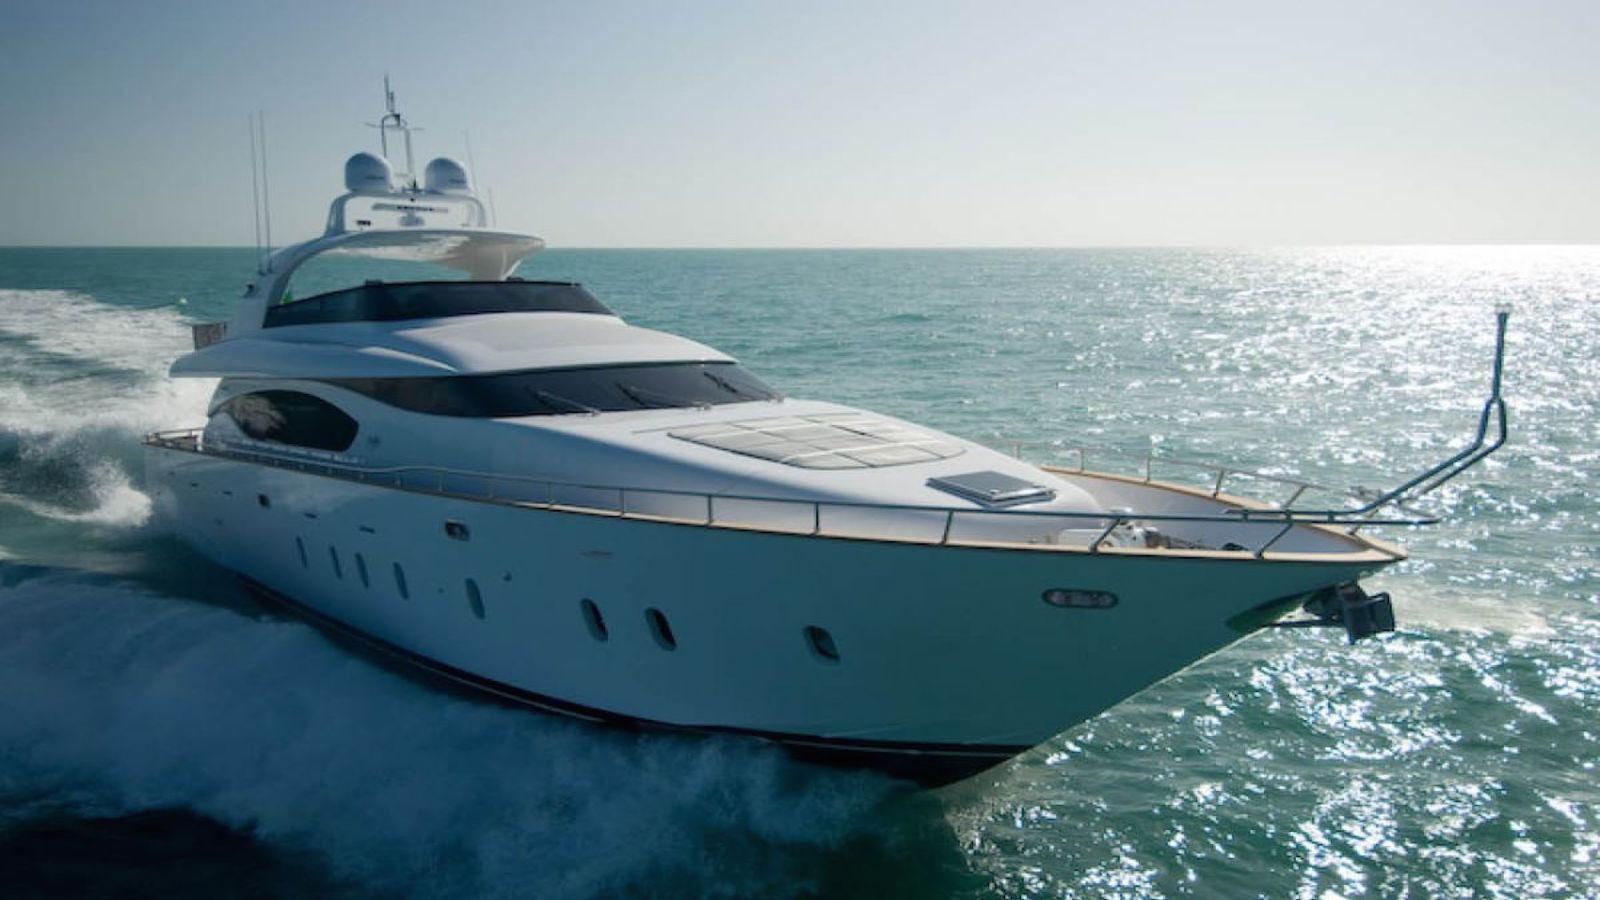 VITA superyacht sold by IYC